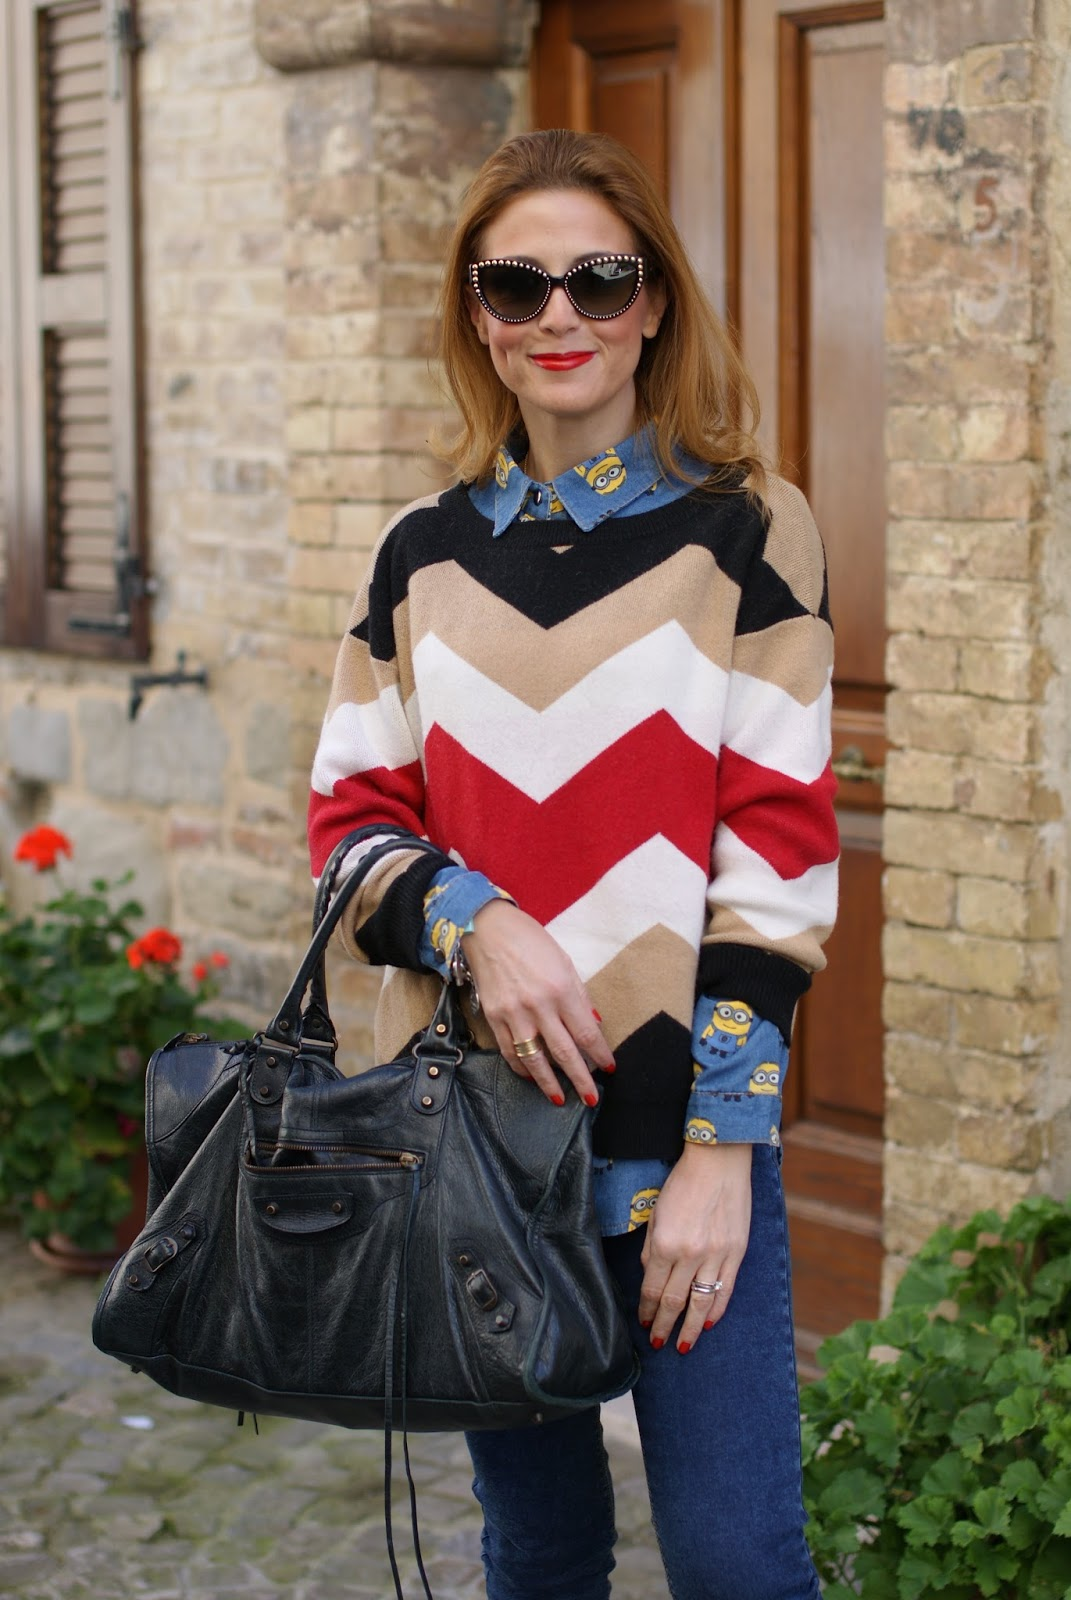 Minions clothing for adults, Minions shirt, Balenciaga work bag and chevron sweater on Fashion and Cookies fashion blog, fashion blogger style